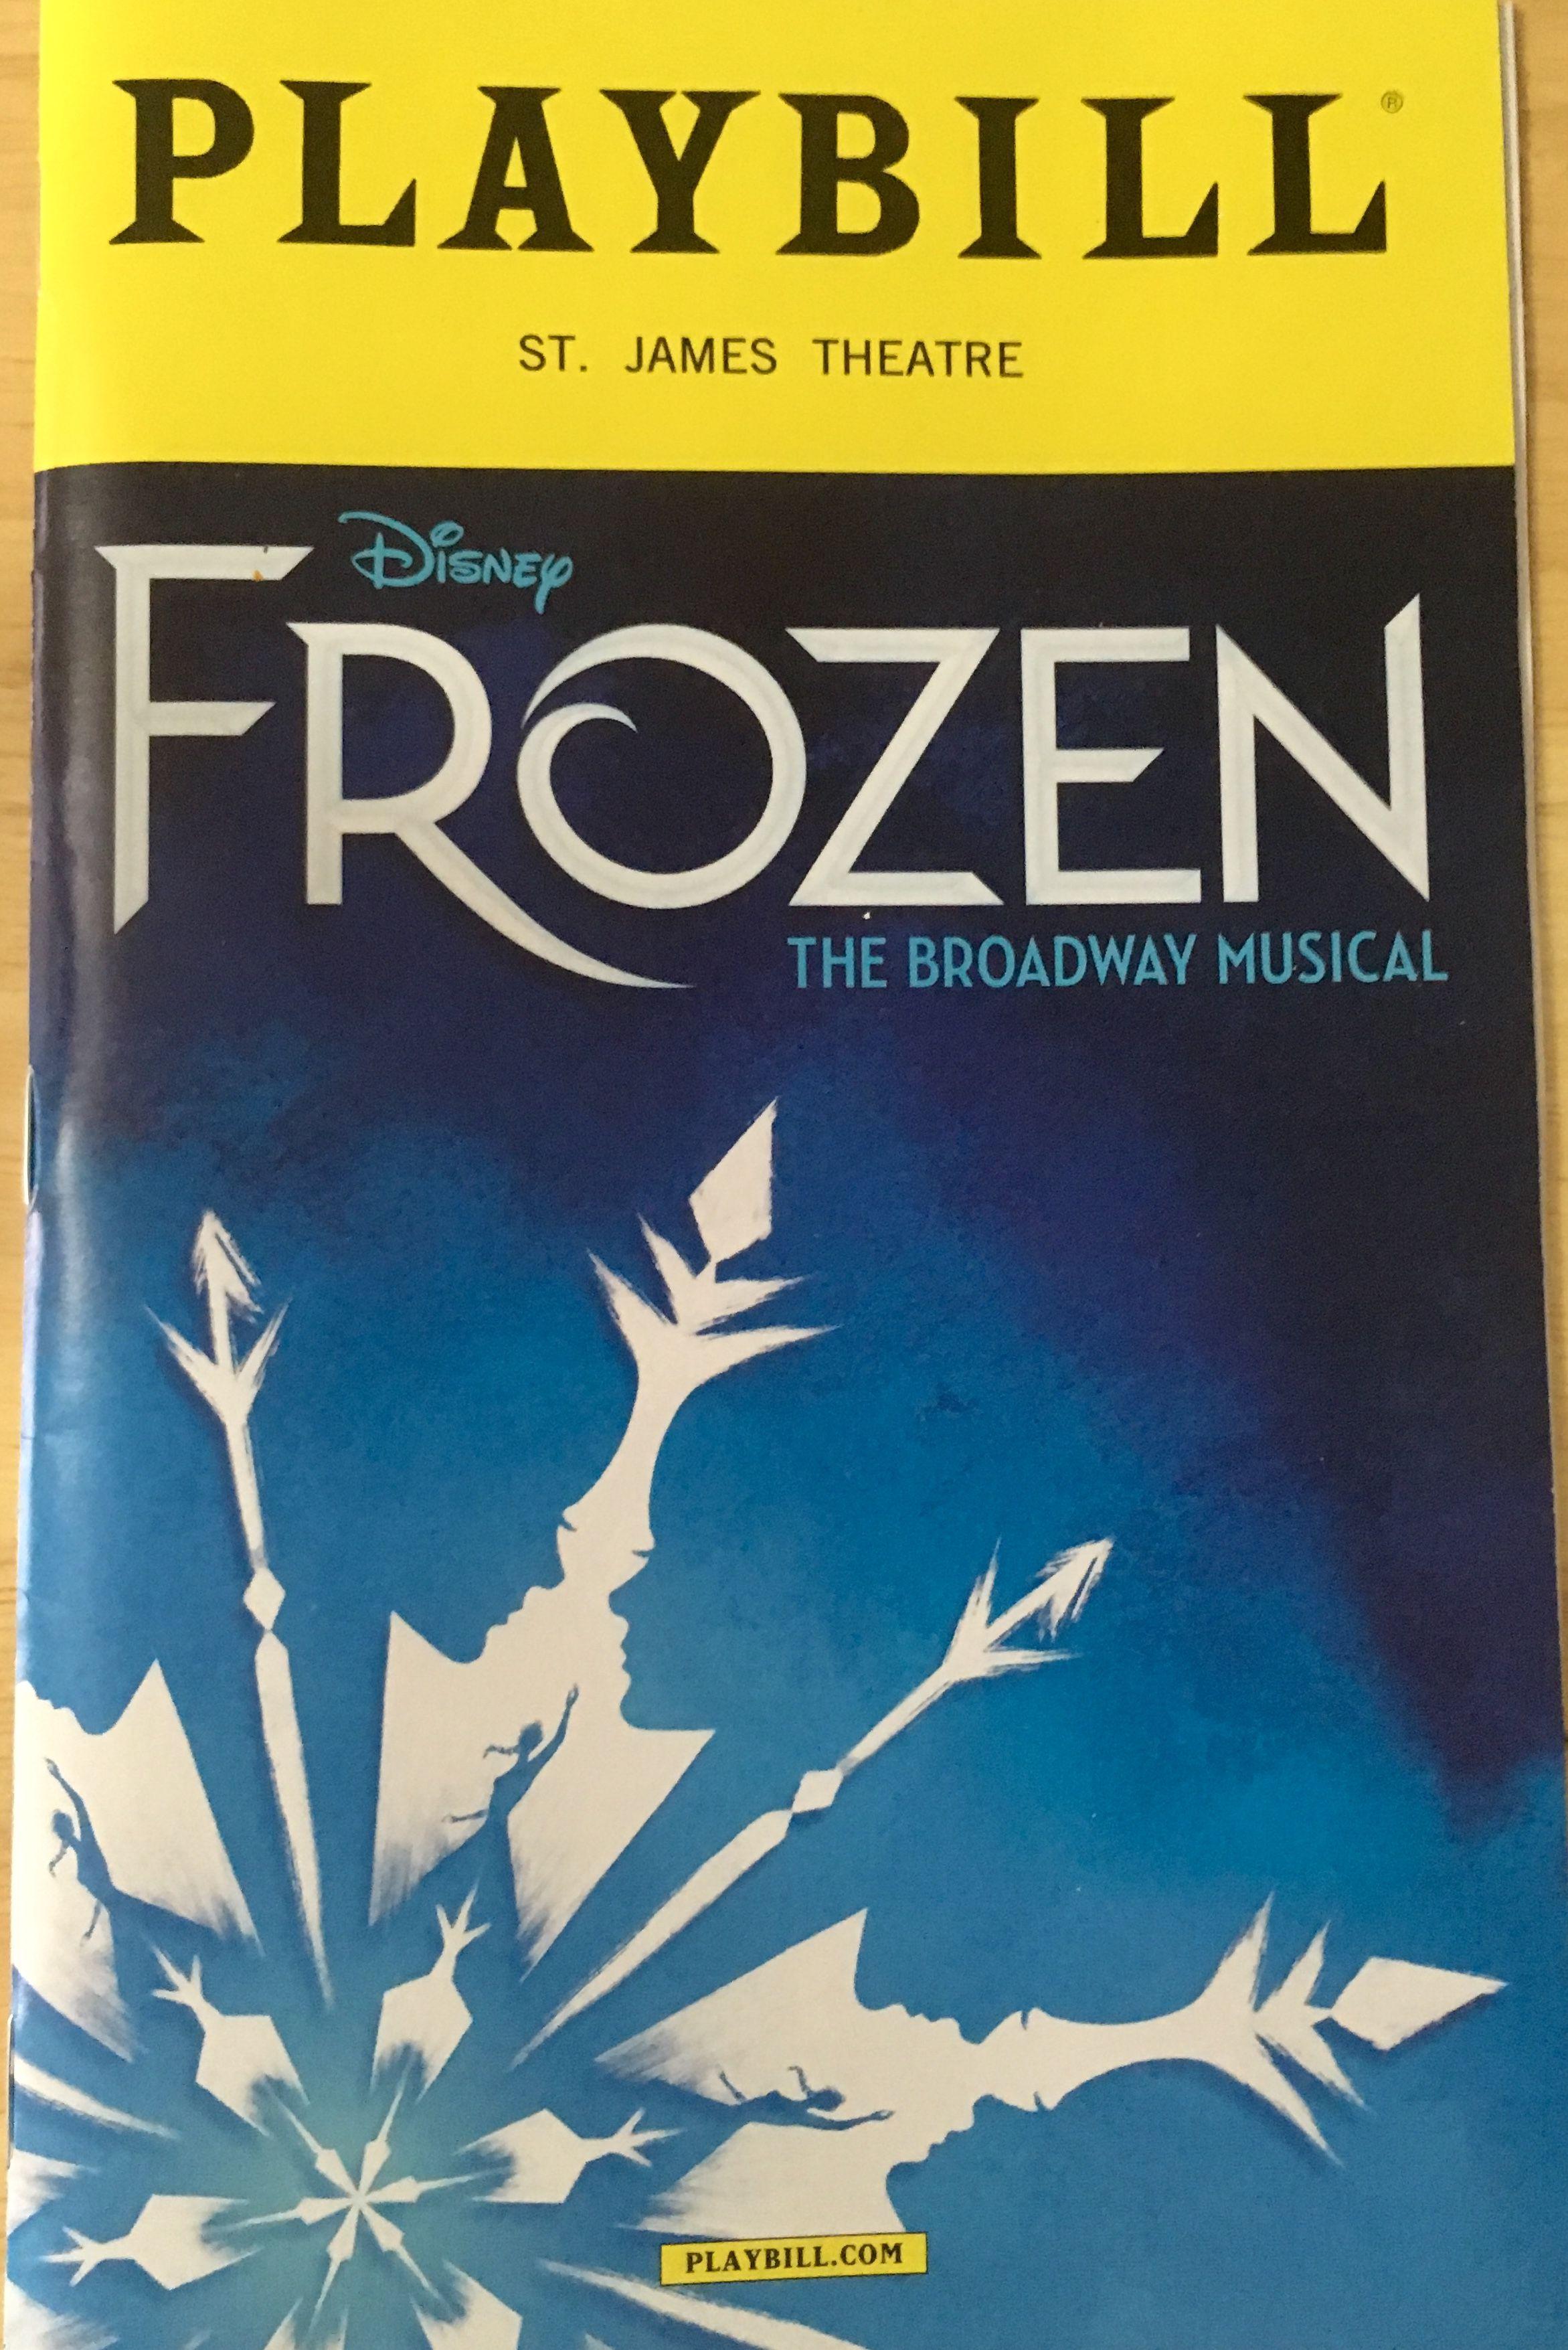 Great show | PLAYBILL - SEEN IT LIVE! | Broadway tickets, Musicals